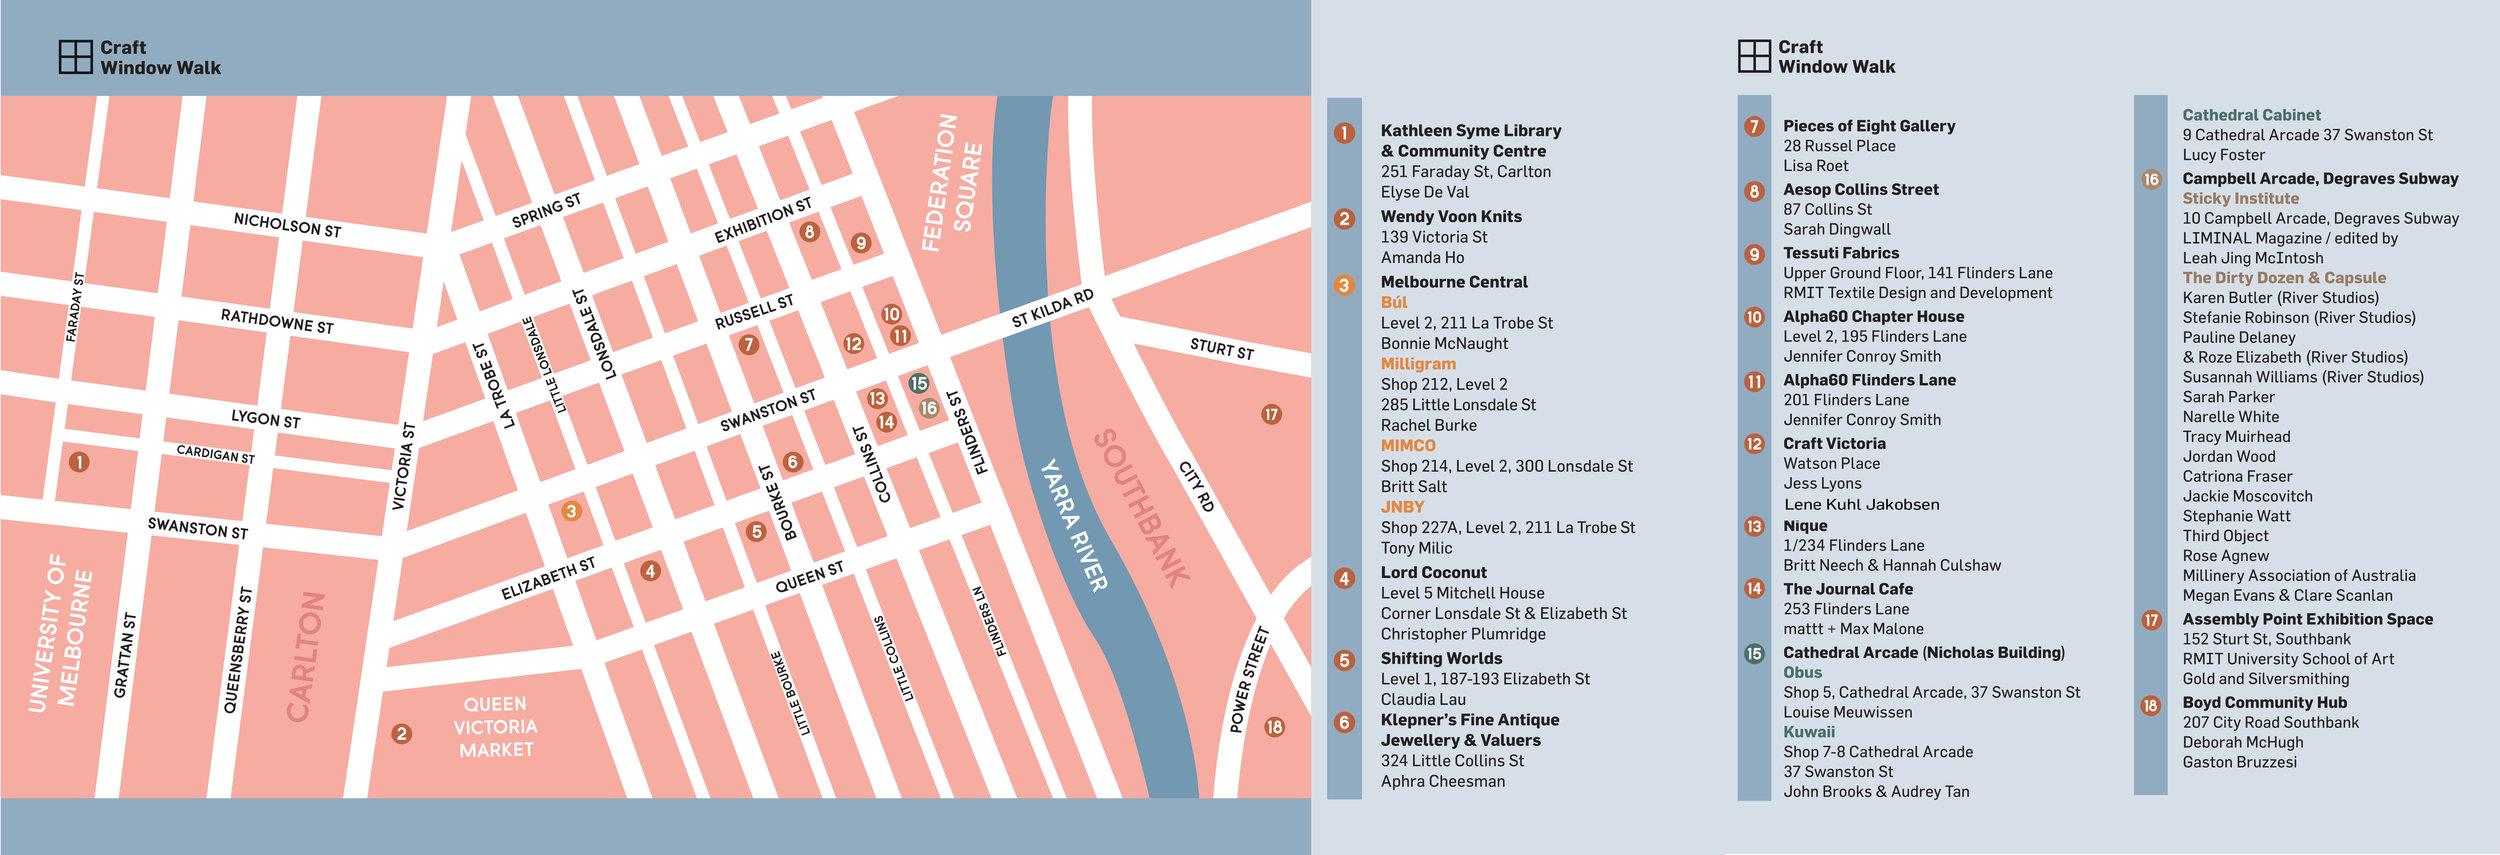 Craft_Cubed_Windowwalk map 2019.jpg